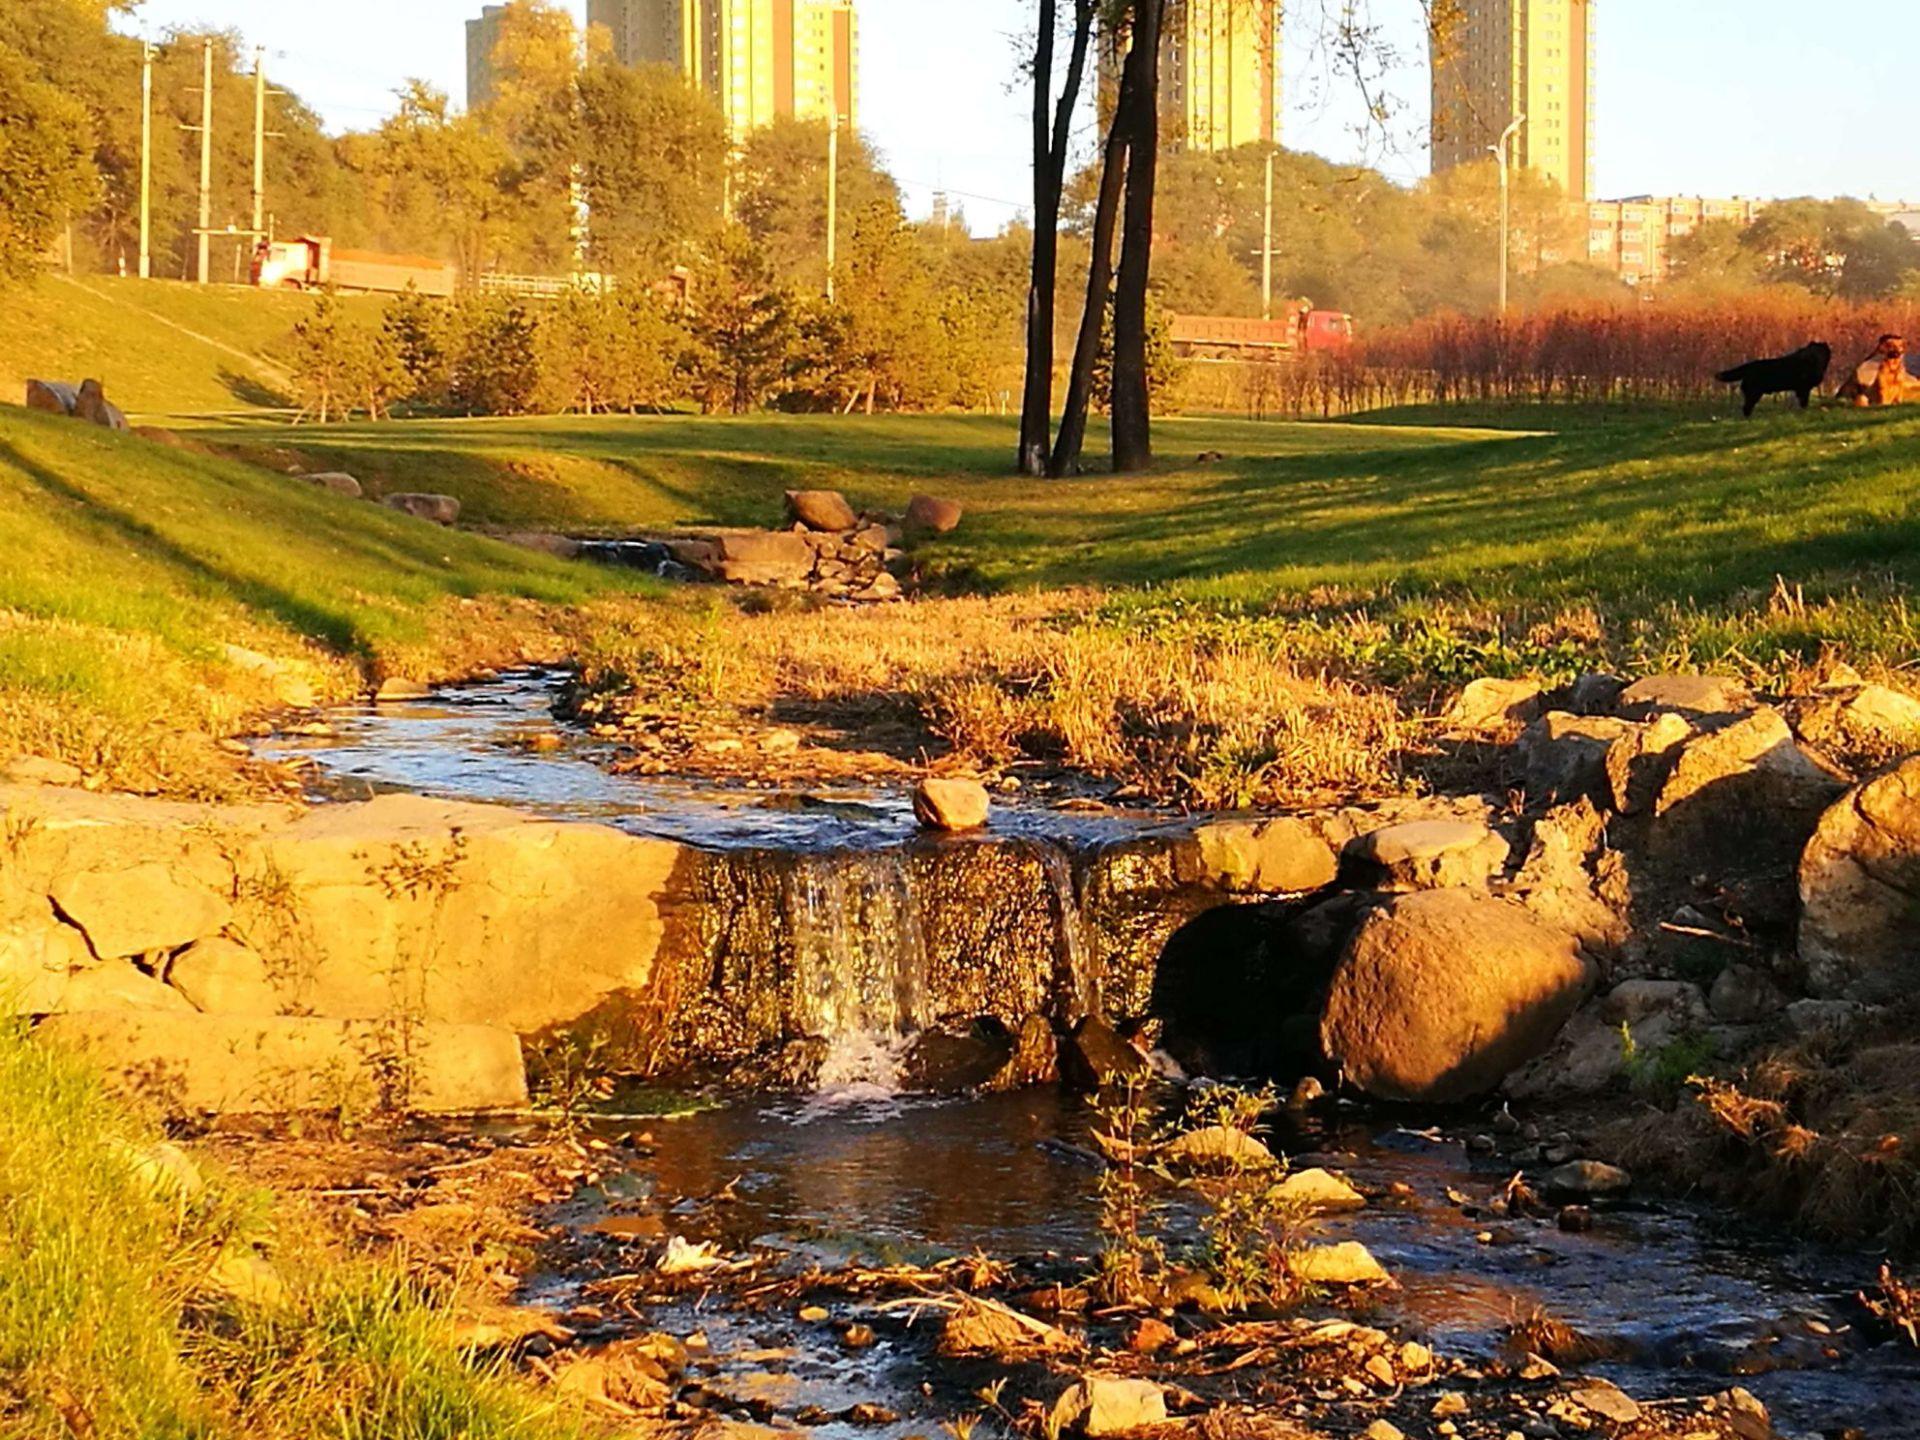 Tianshuihu Park